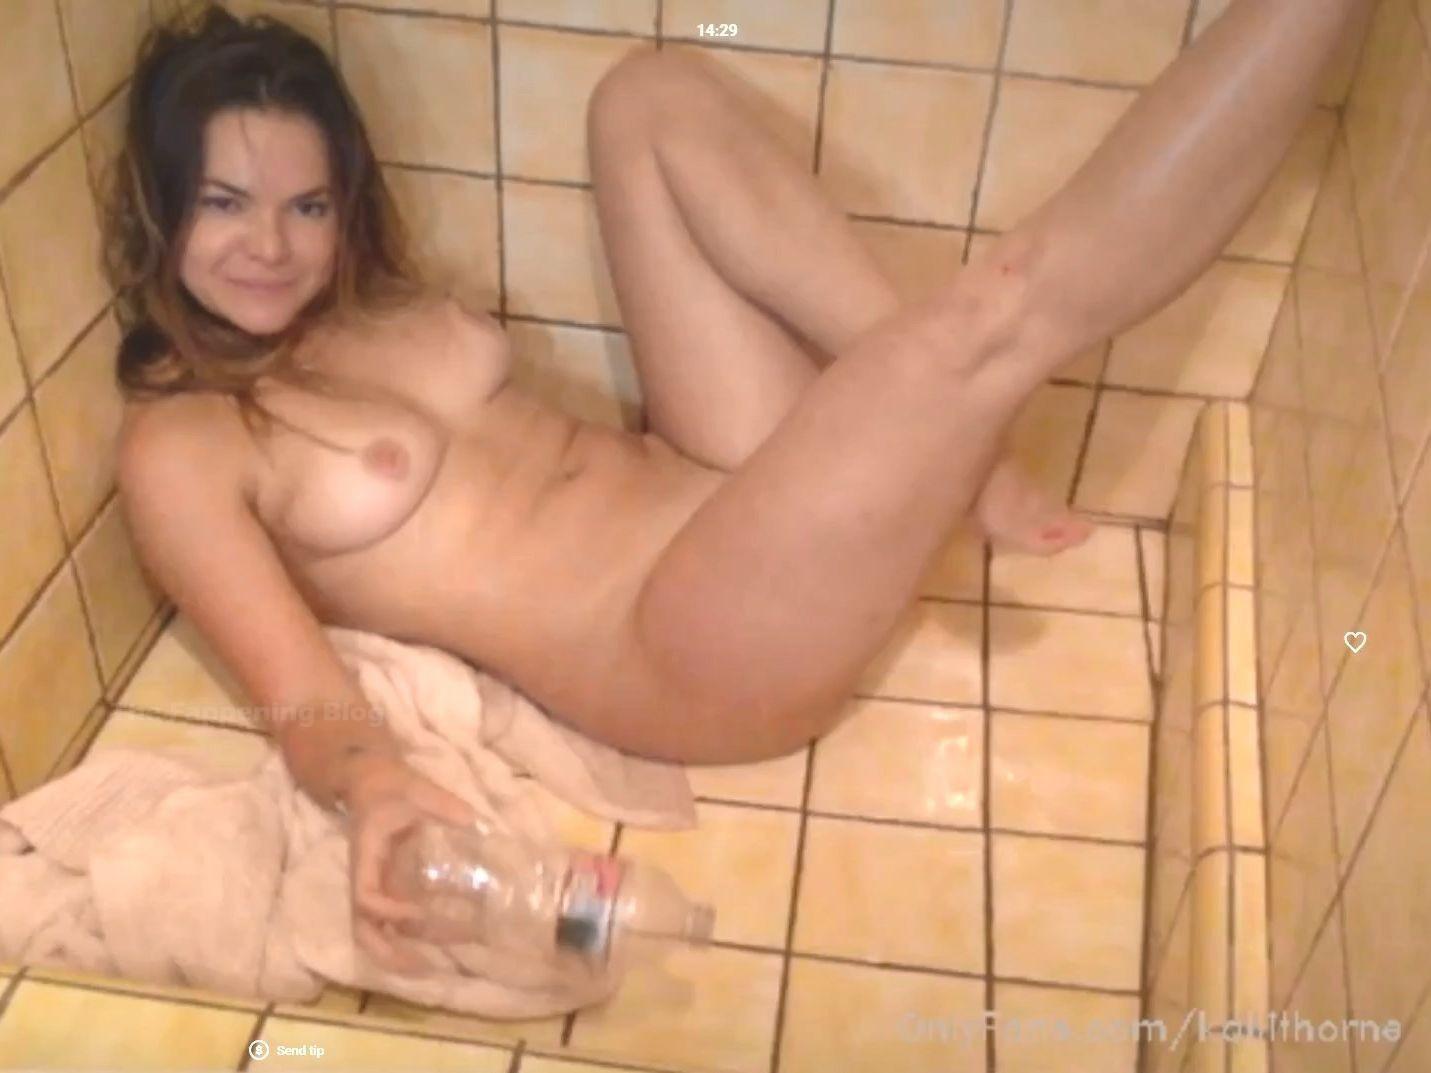 Kaili Thorne Nude fappenings.com 7